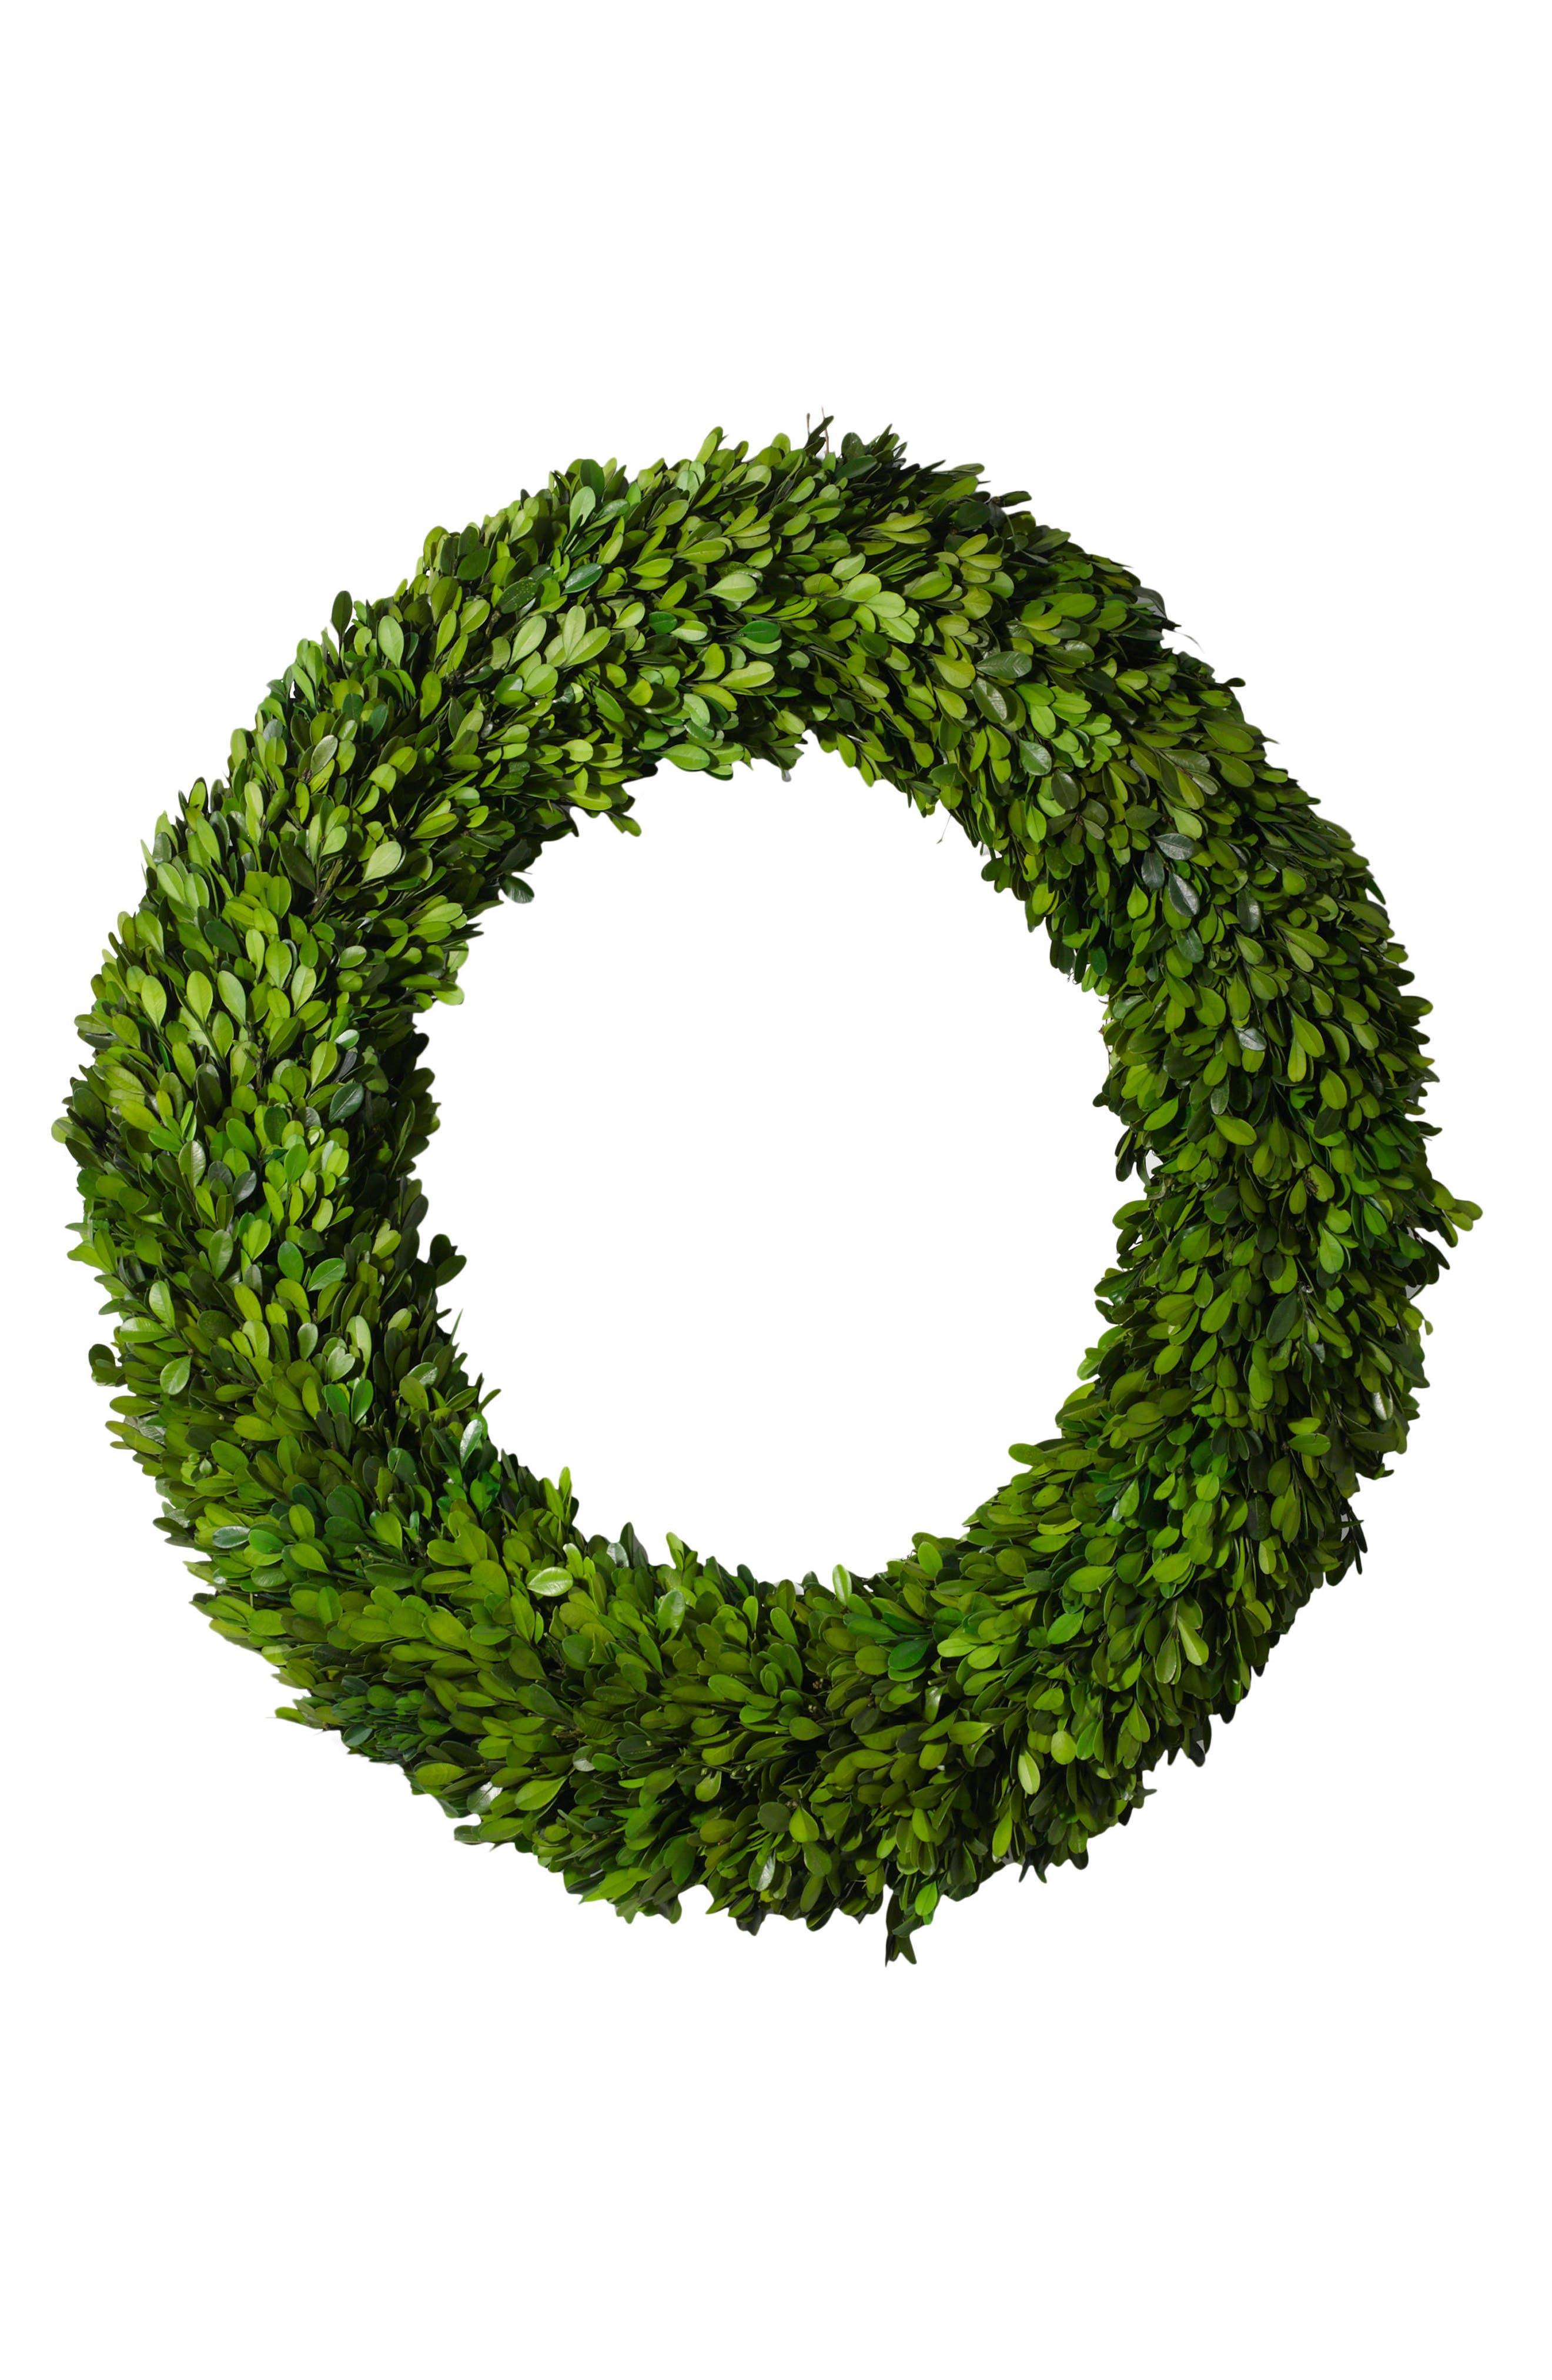 Alternate Image 1 Selected - Accent Decor Boxwood Wreath